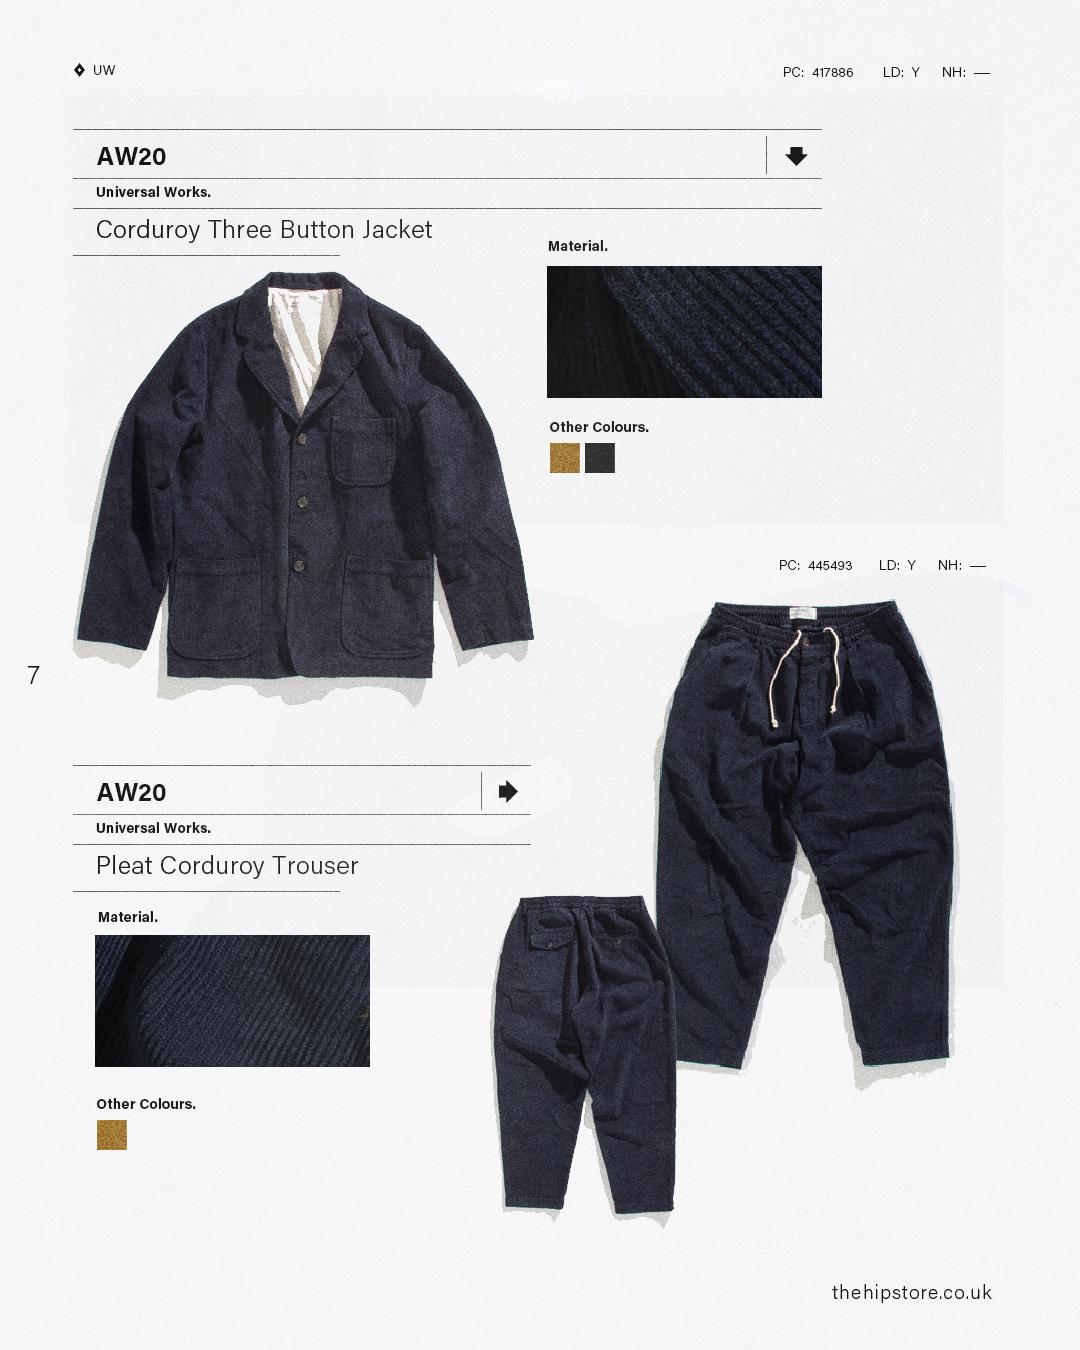 HIP Staff Picks: Universal Works AW20 Corduroy Three Button Jacket Pleat Corduroy Trouser